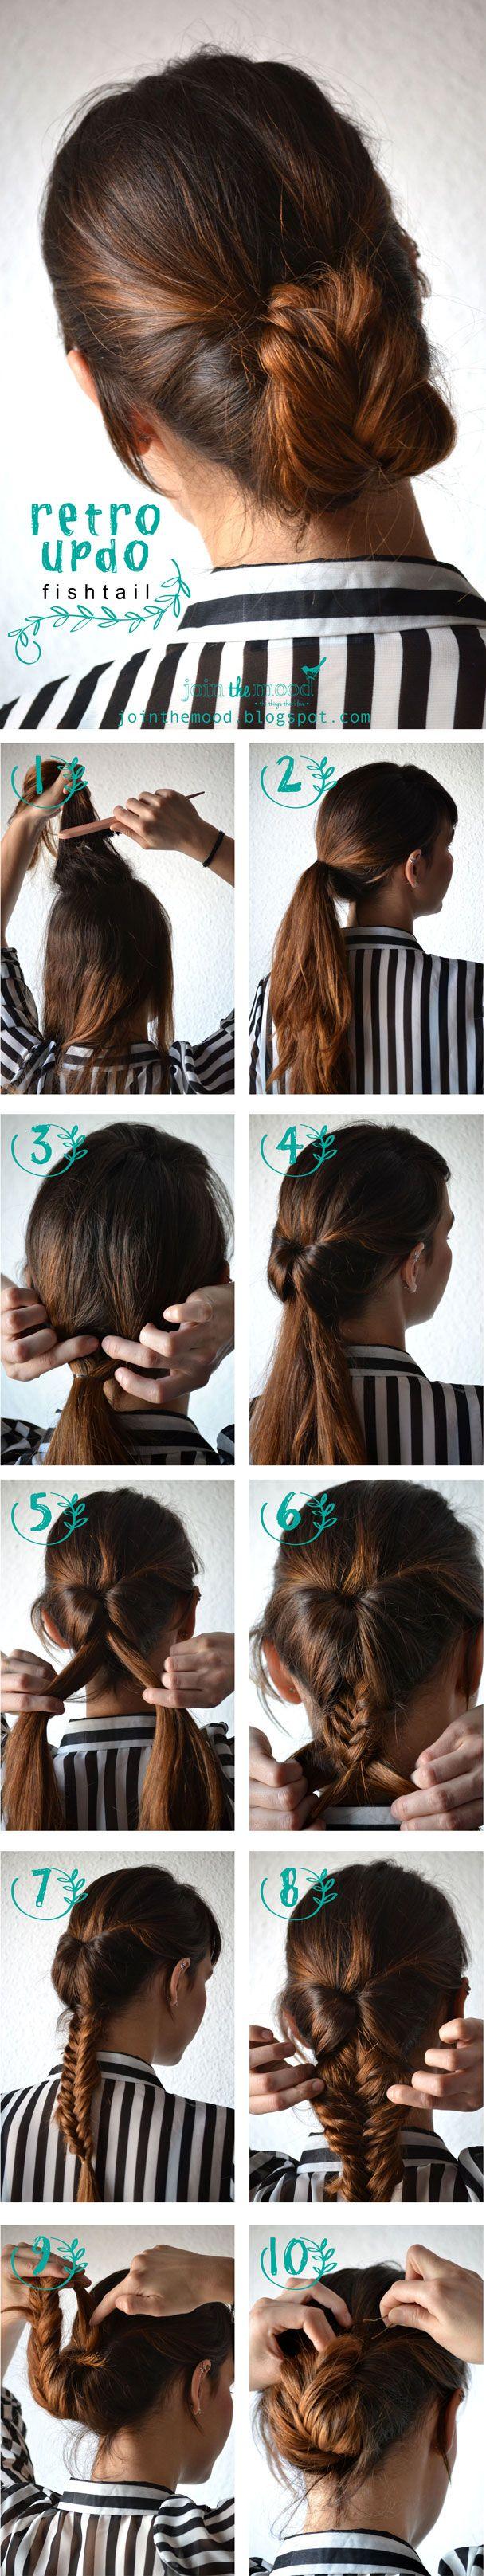 impossibly cute quinceañera hair ideas retro updo fishtail